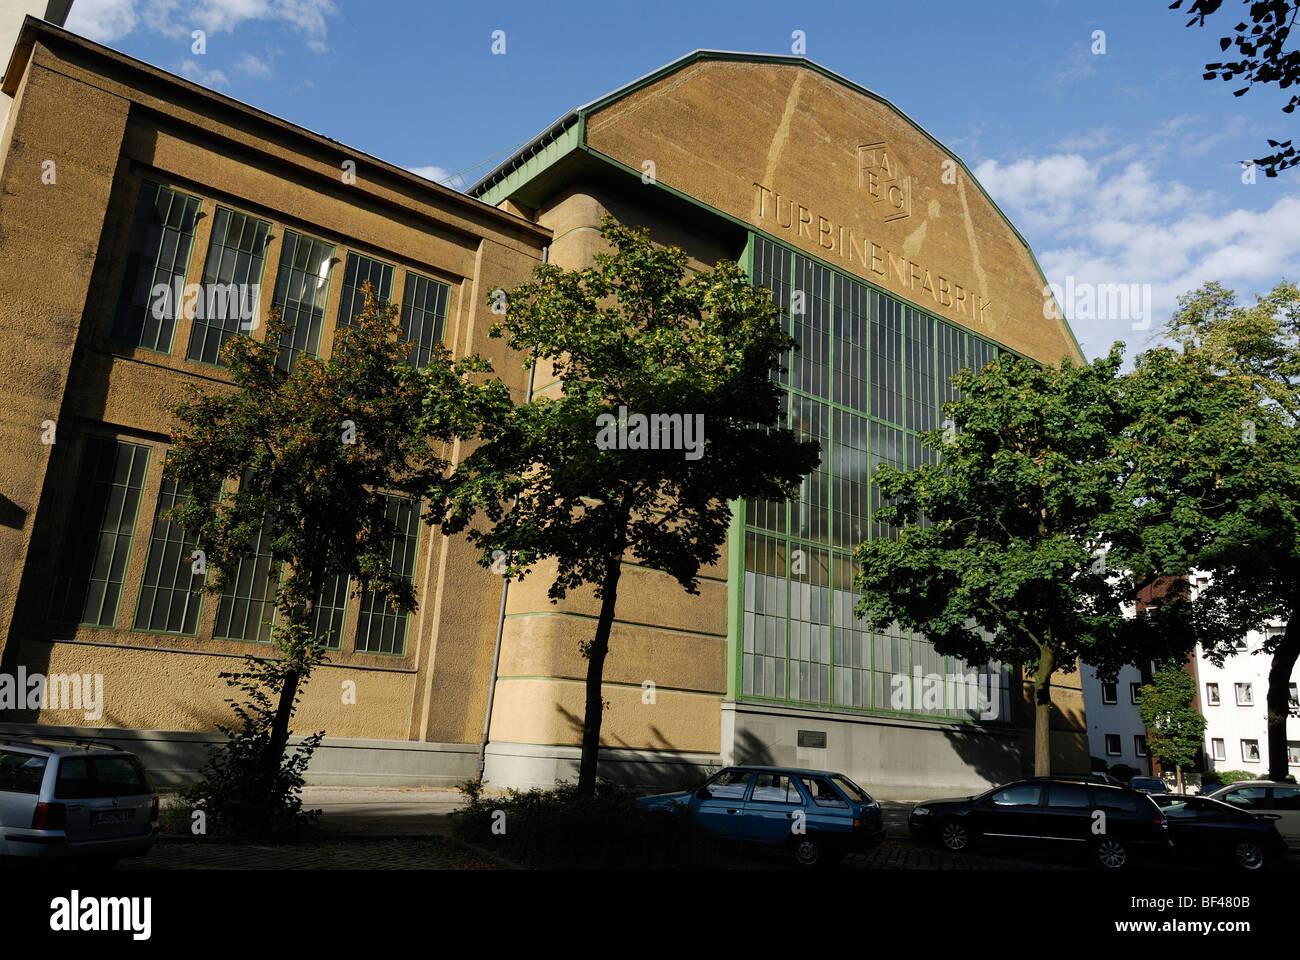 Berlin. Germany. AEG Turbine factory by Peter Behrens. - Stock Image